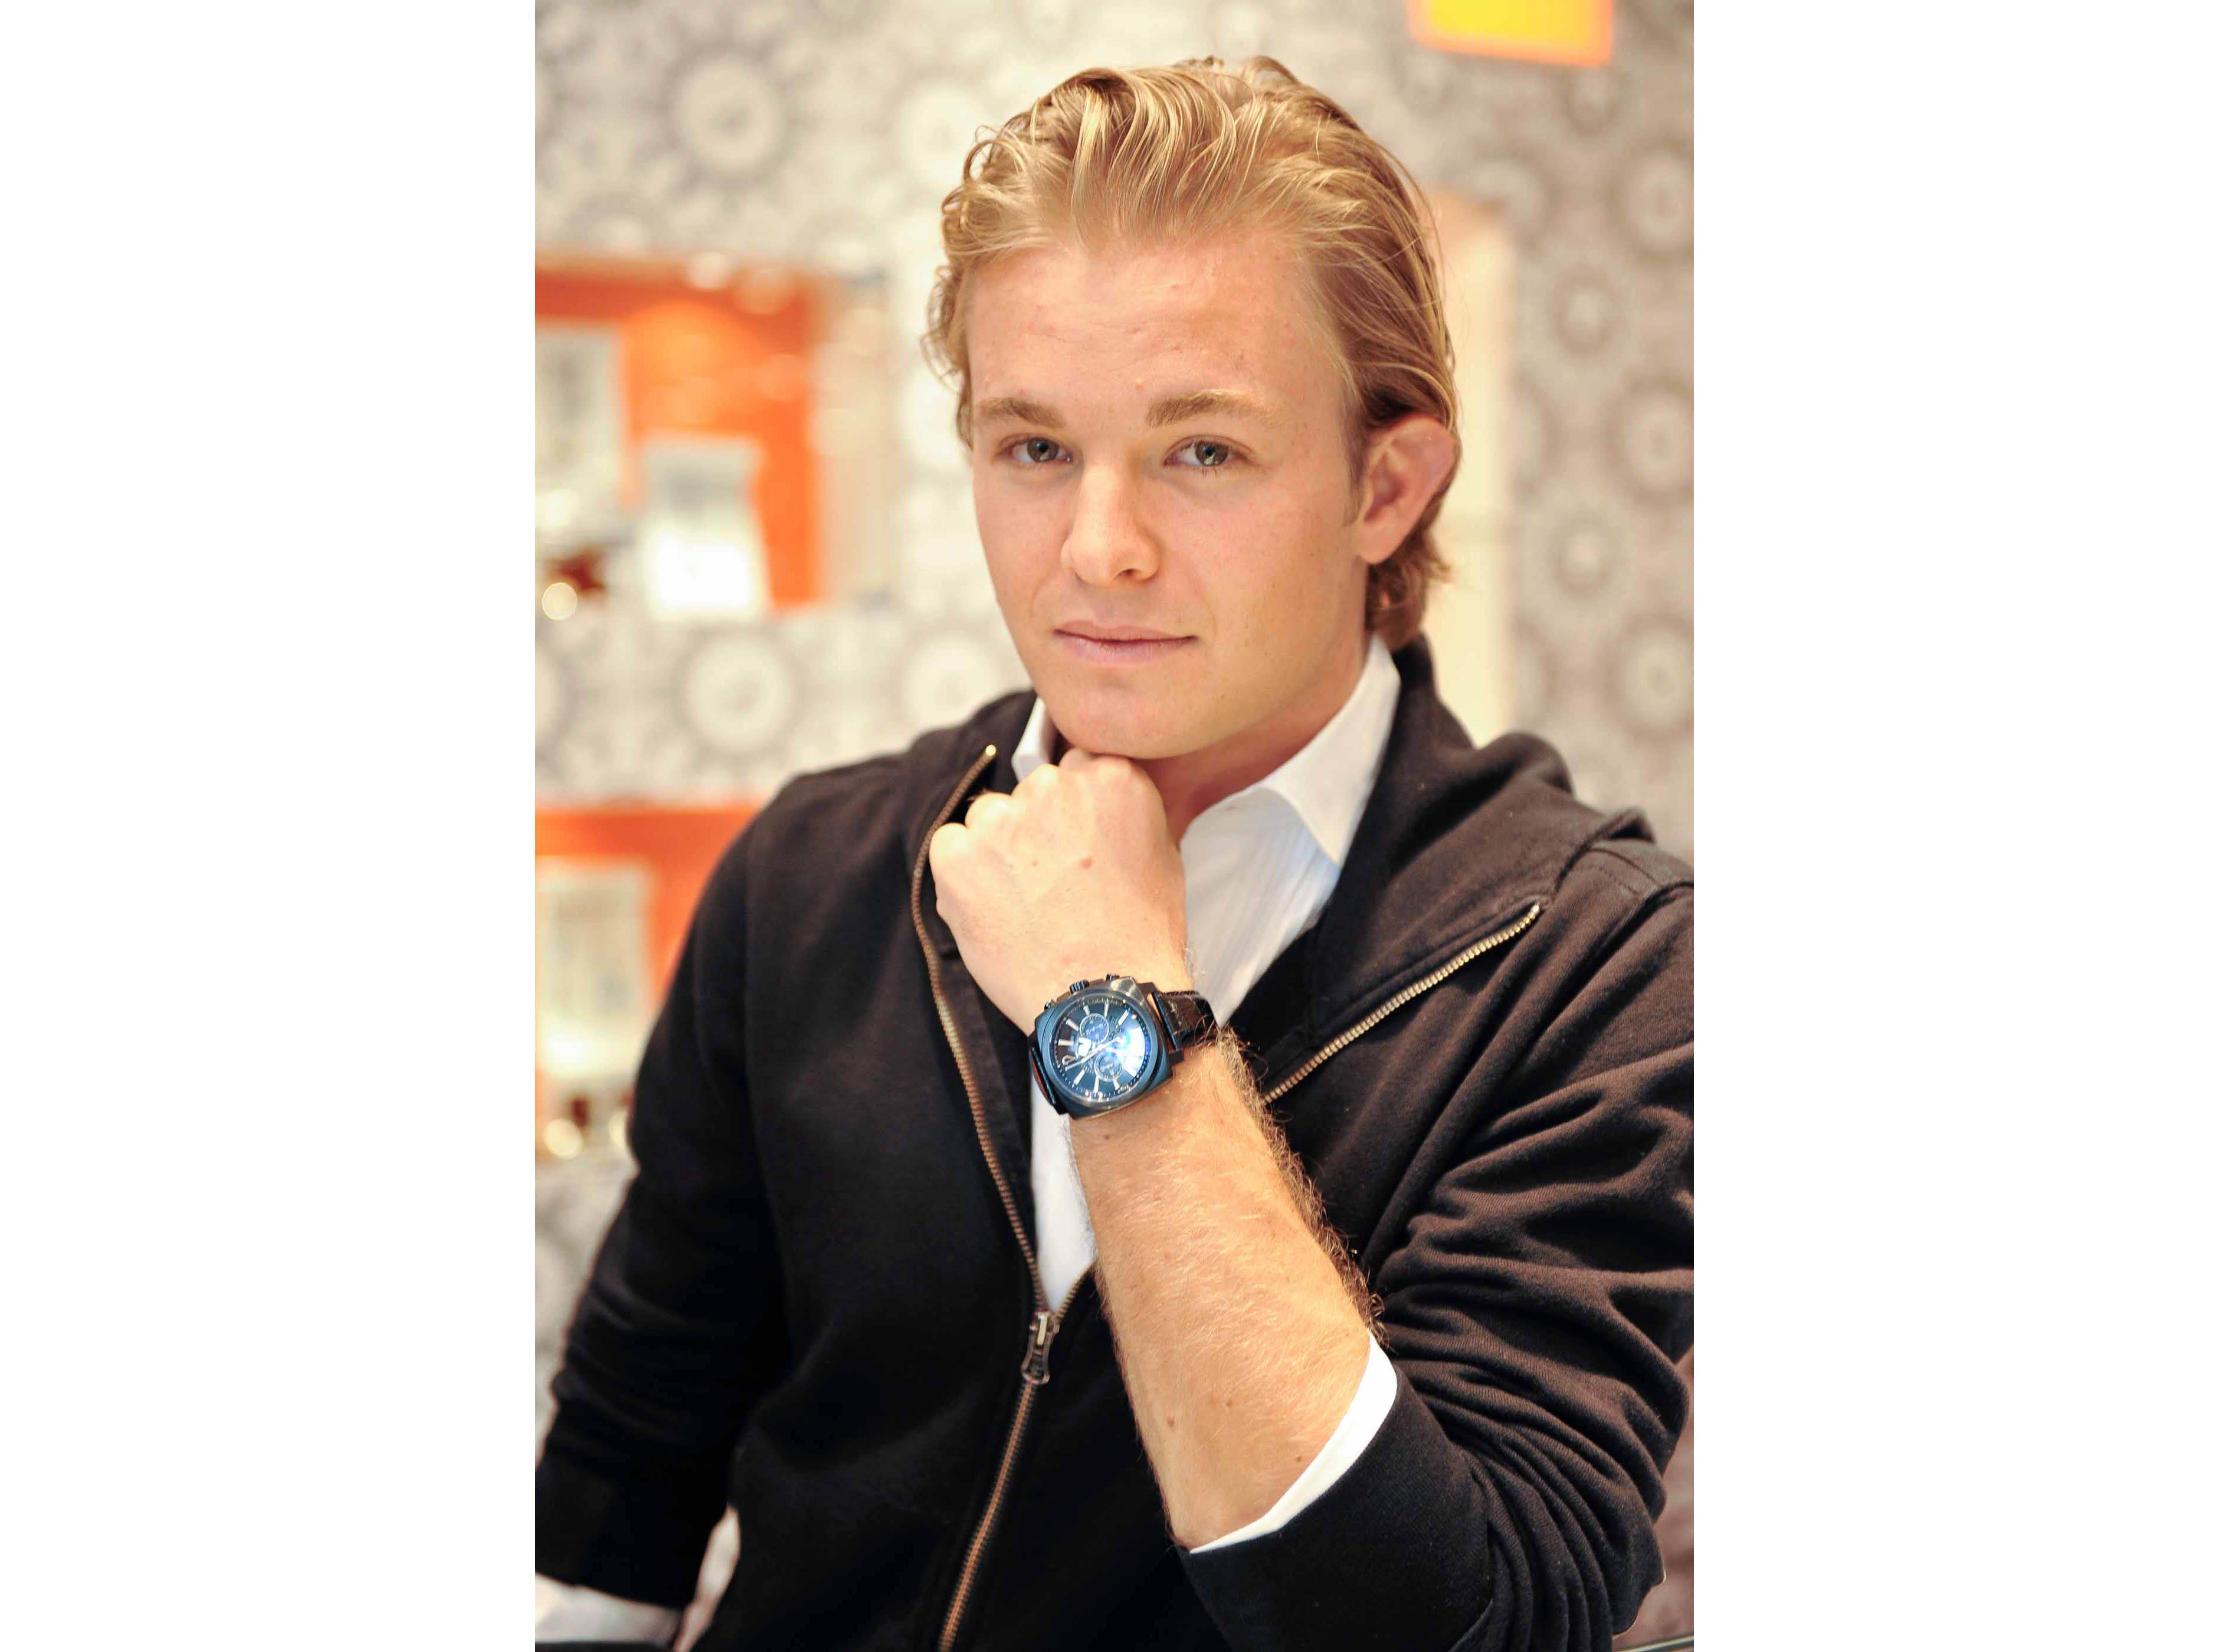 002_Nico_Rosberg_2 12qu02